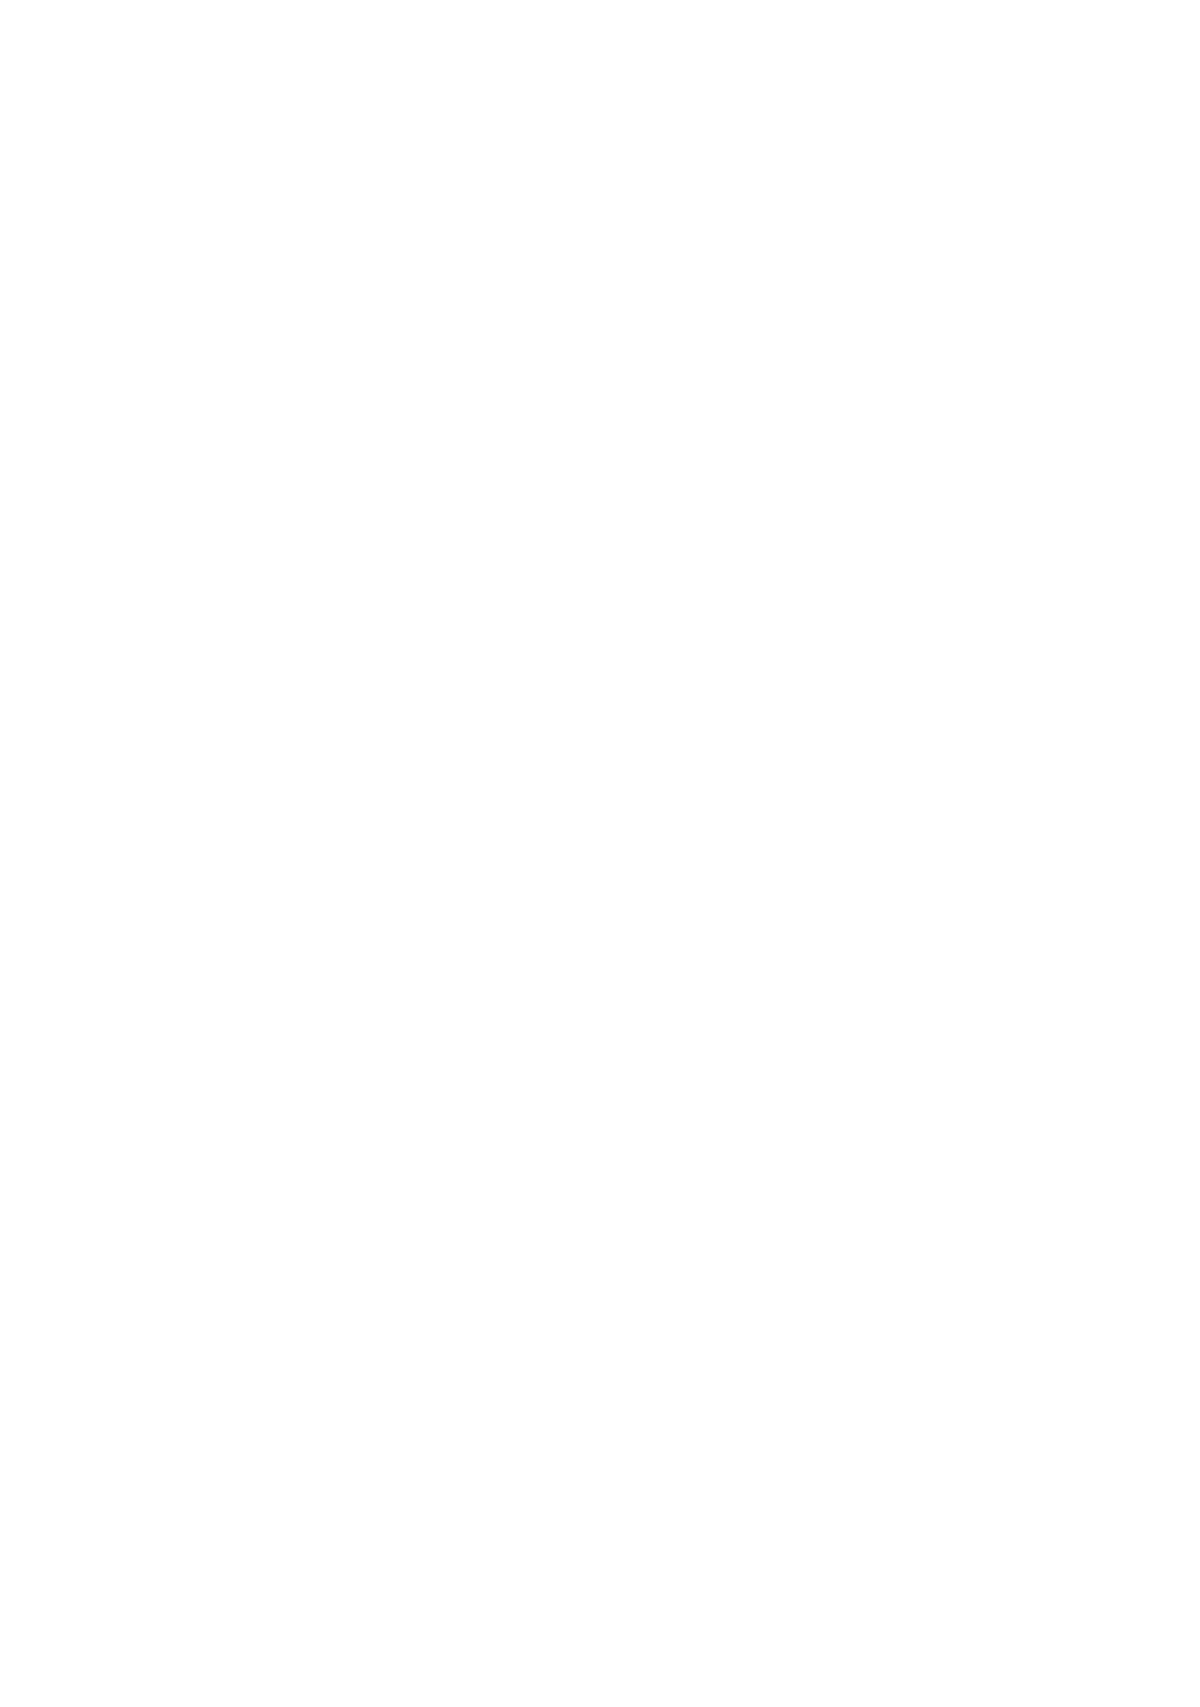 Yasei no Chijo ga Arawareta! 4   A Wild Nymphomaniac Appeared! 4 1